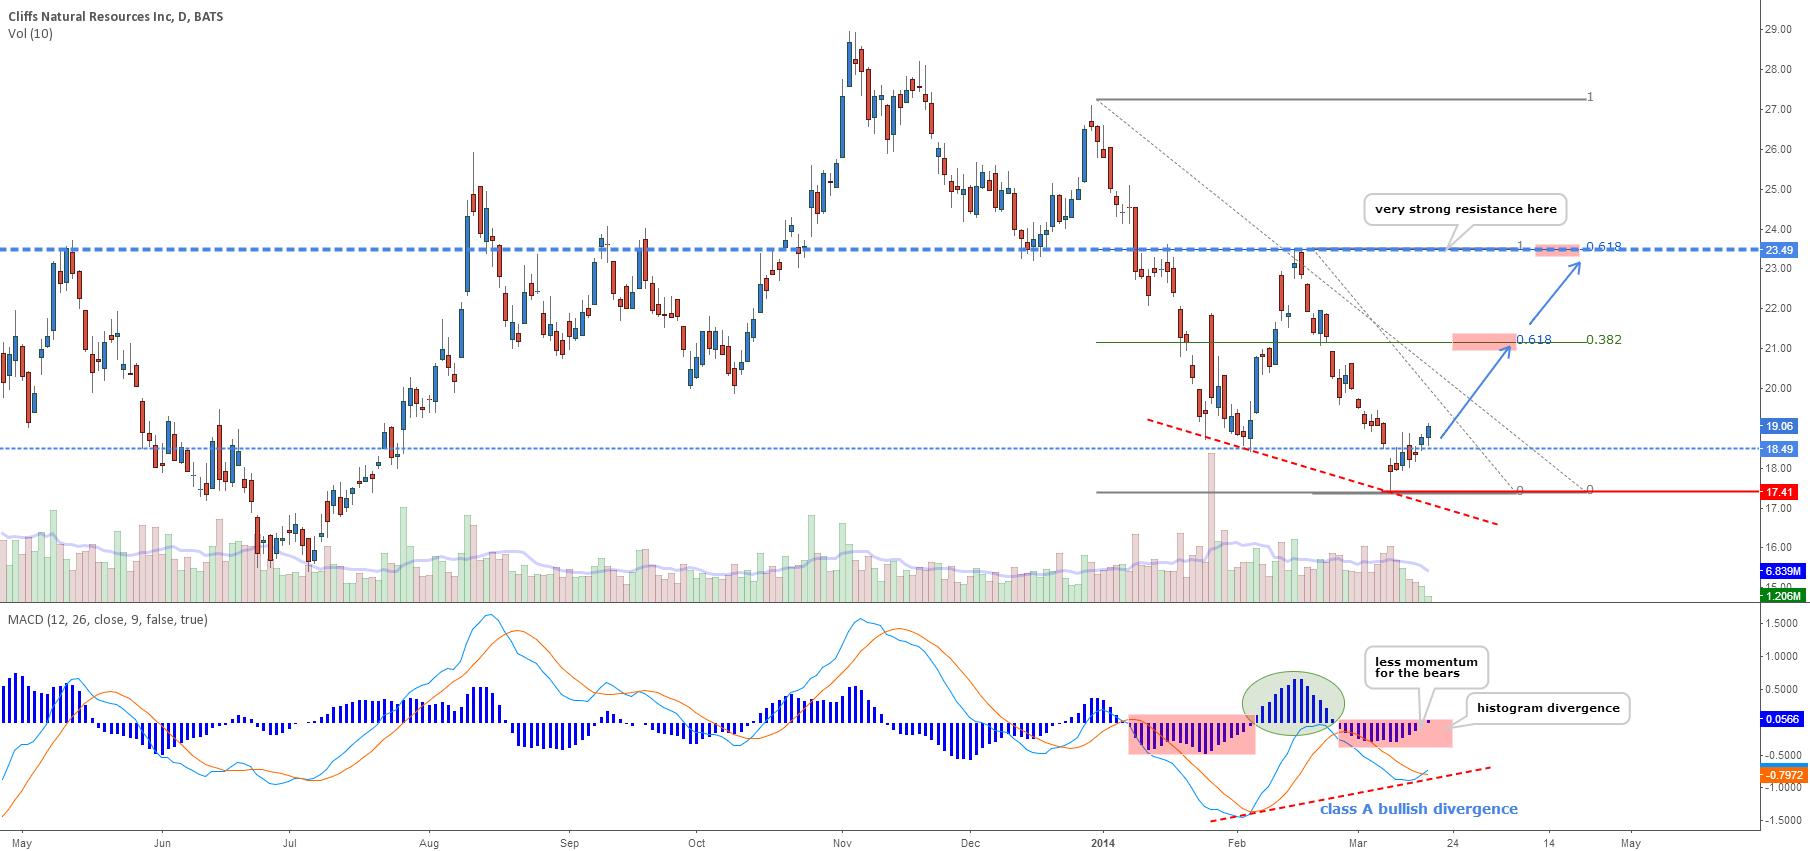 CLF - Daily long on bullish divergence